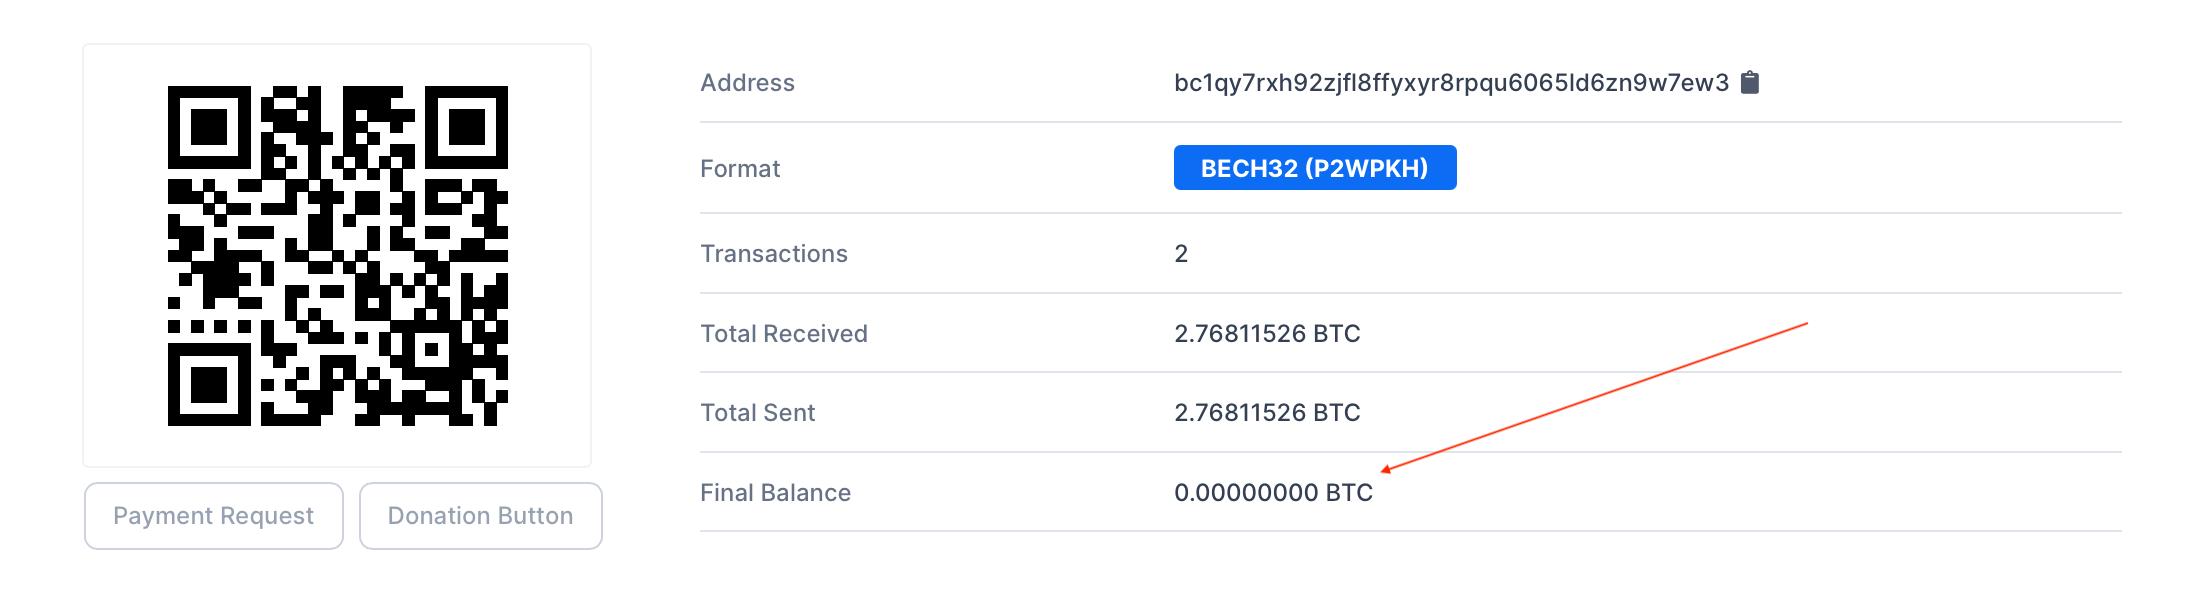 биткоин адрес криптовалюта